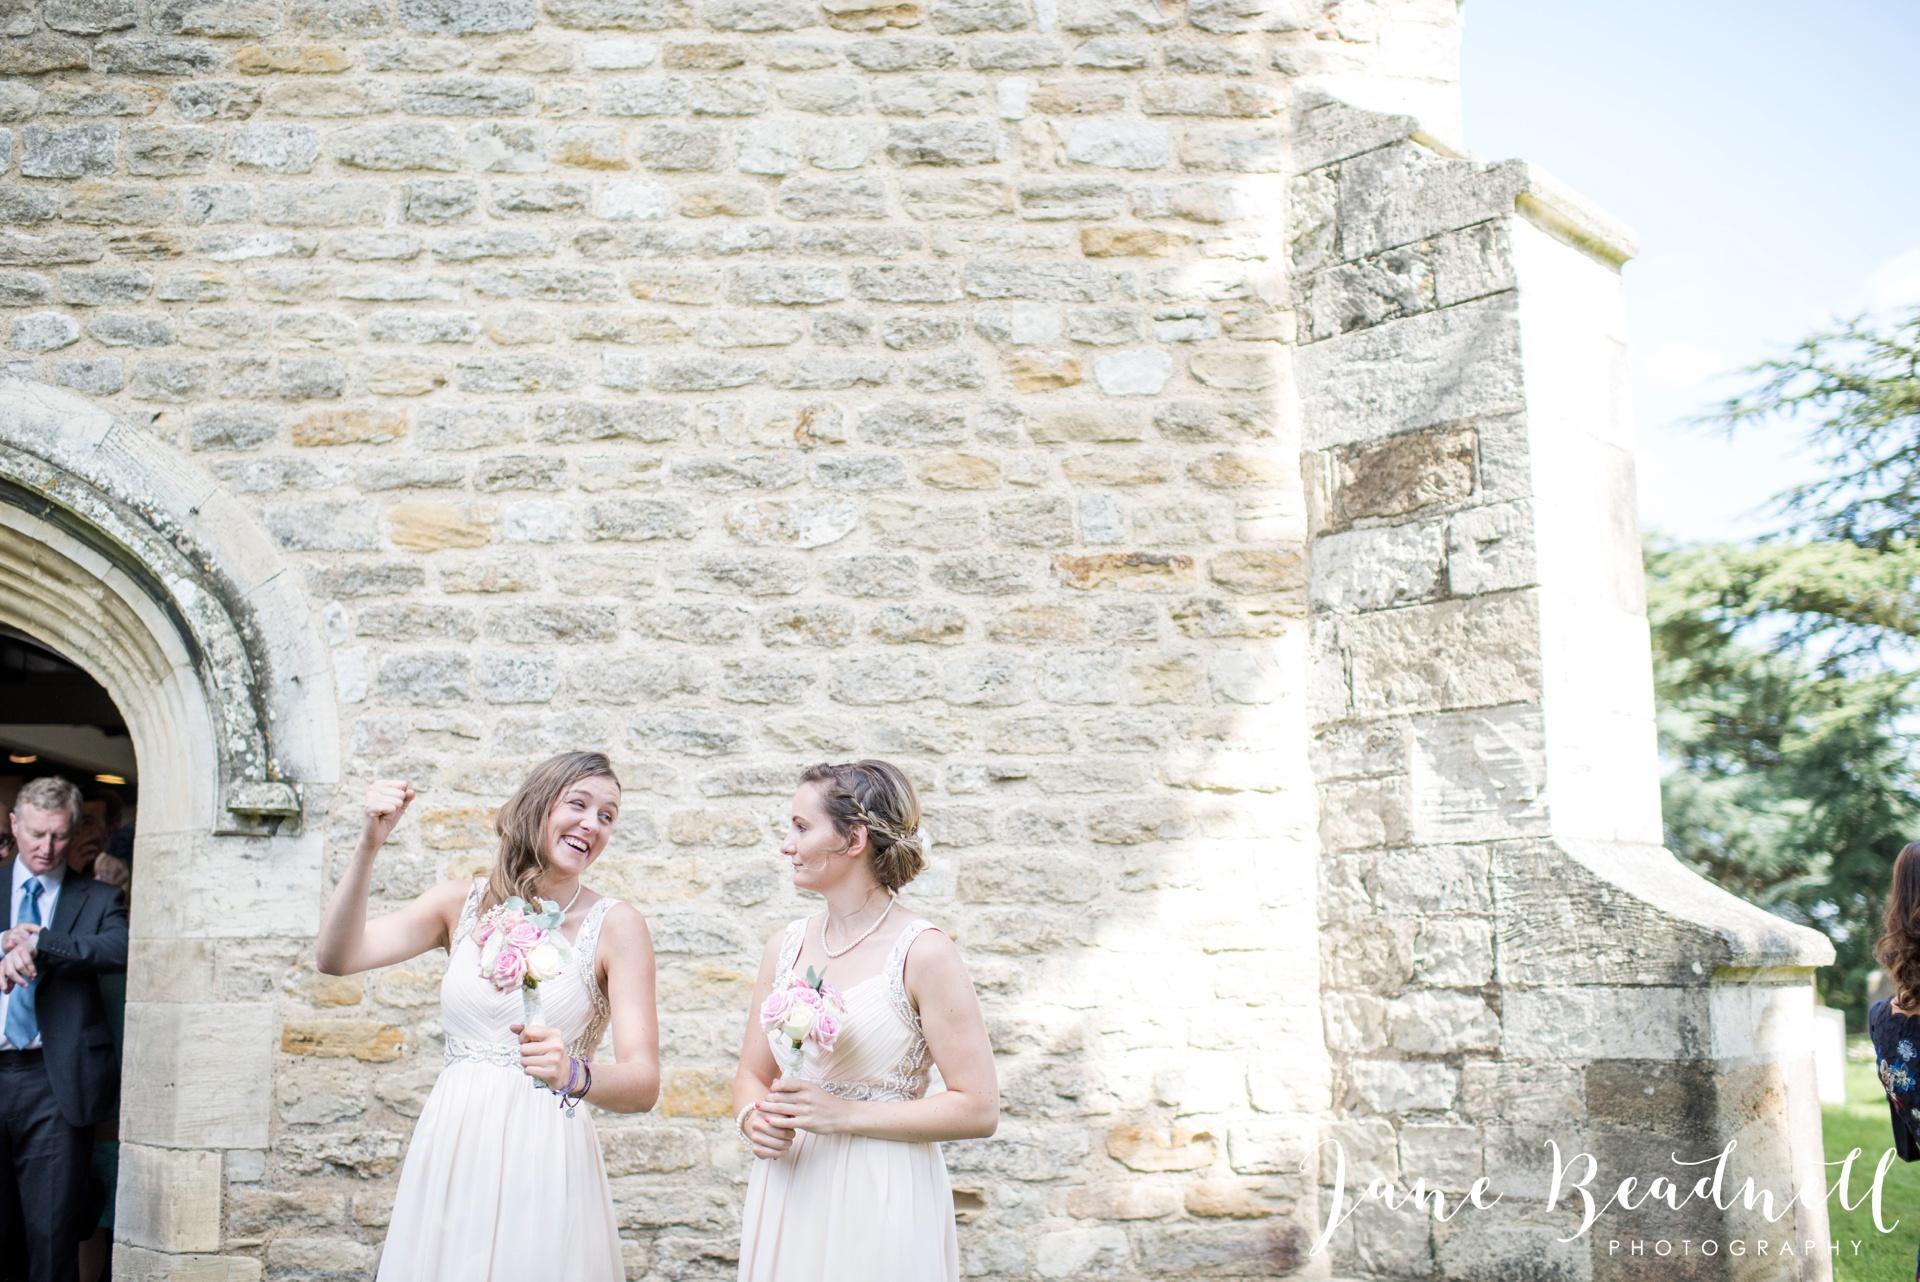 yorkshire-fine-art-wedding-photographer-jane-beadnell-photography-poppleton-york_0060